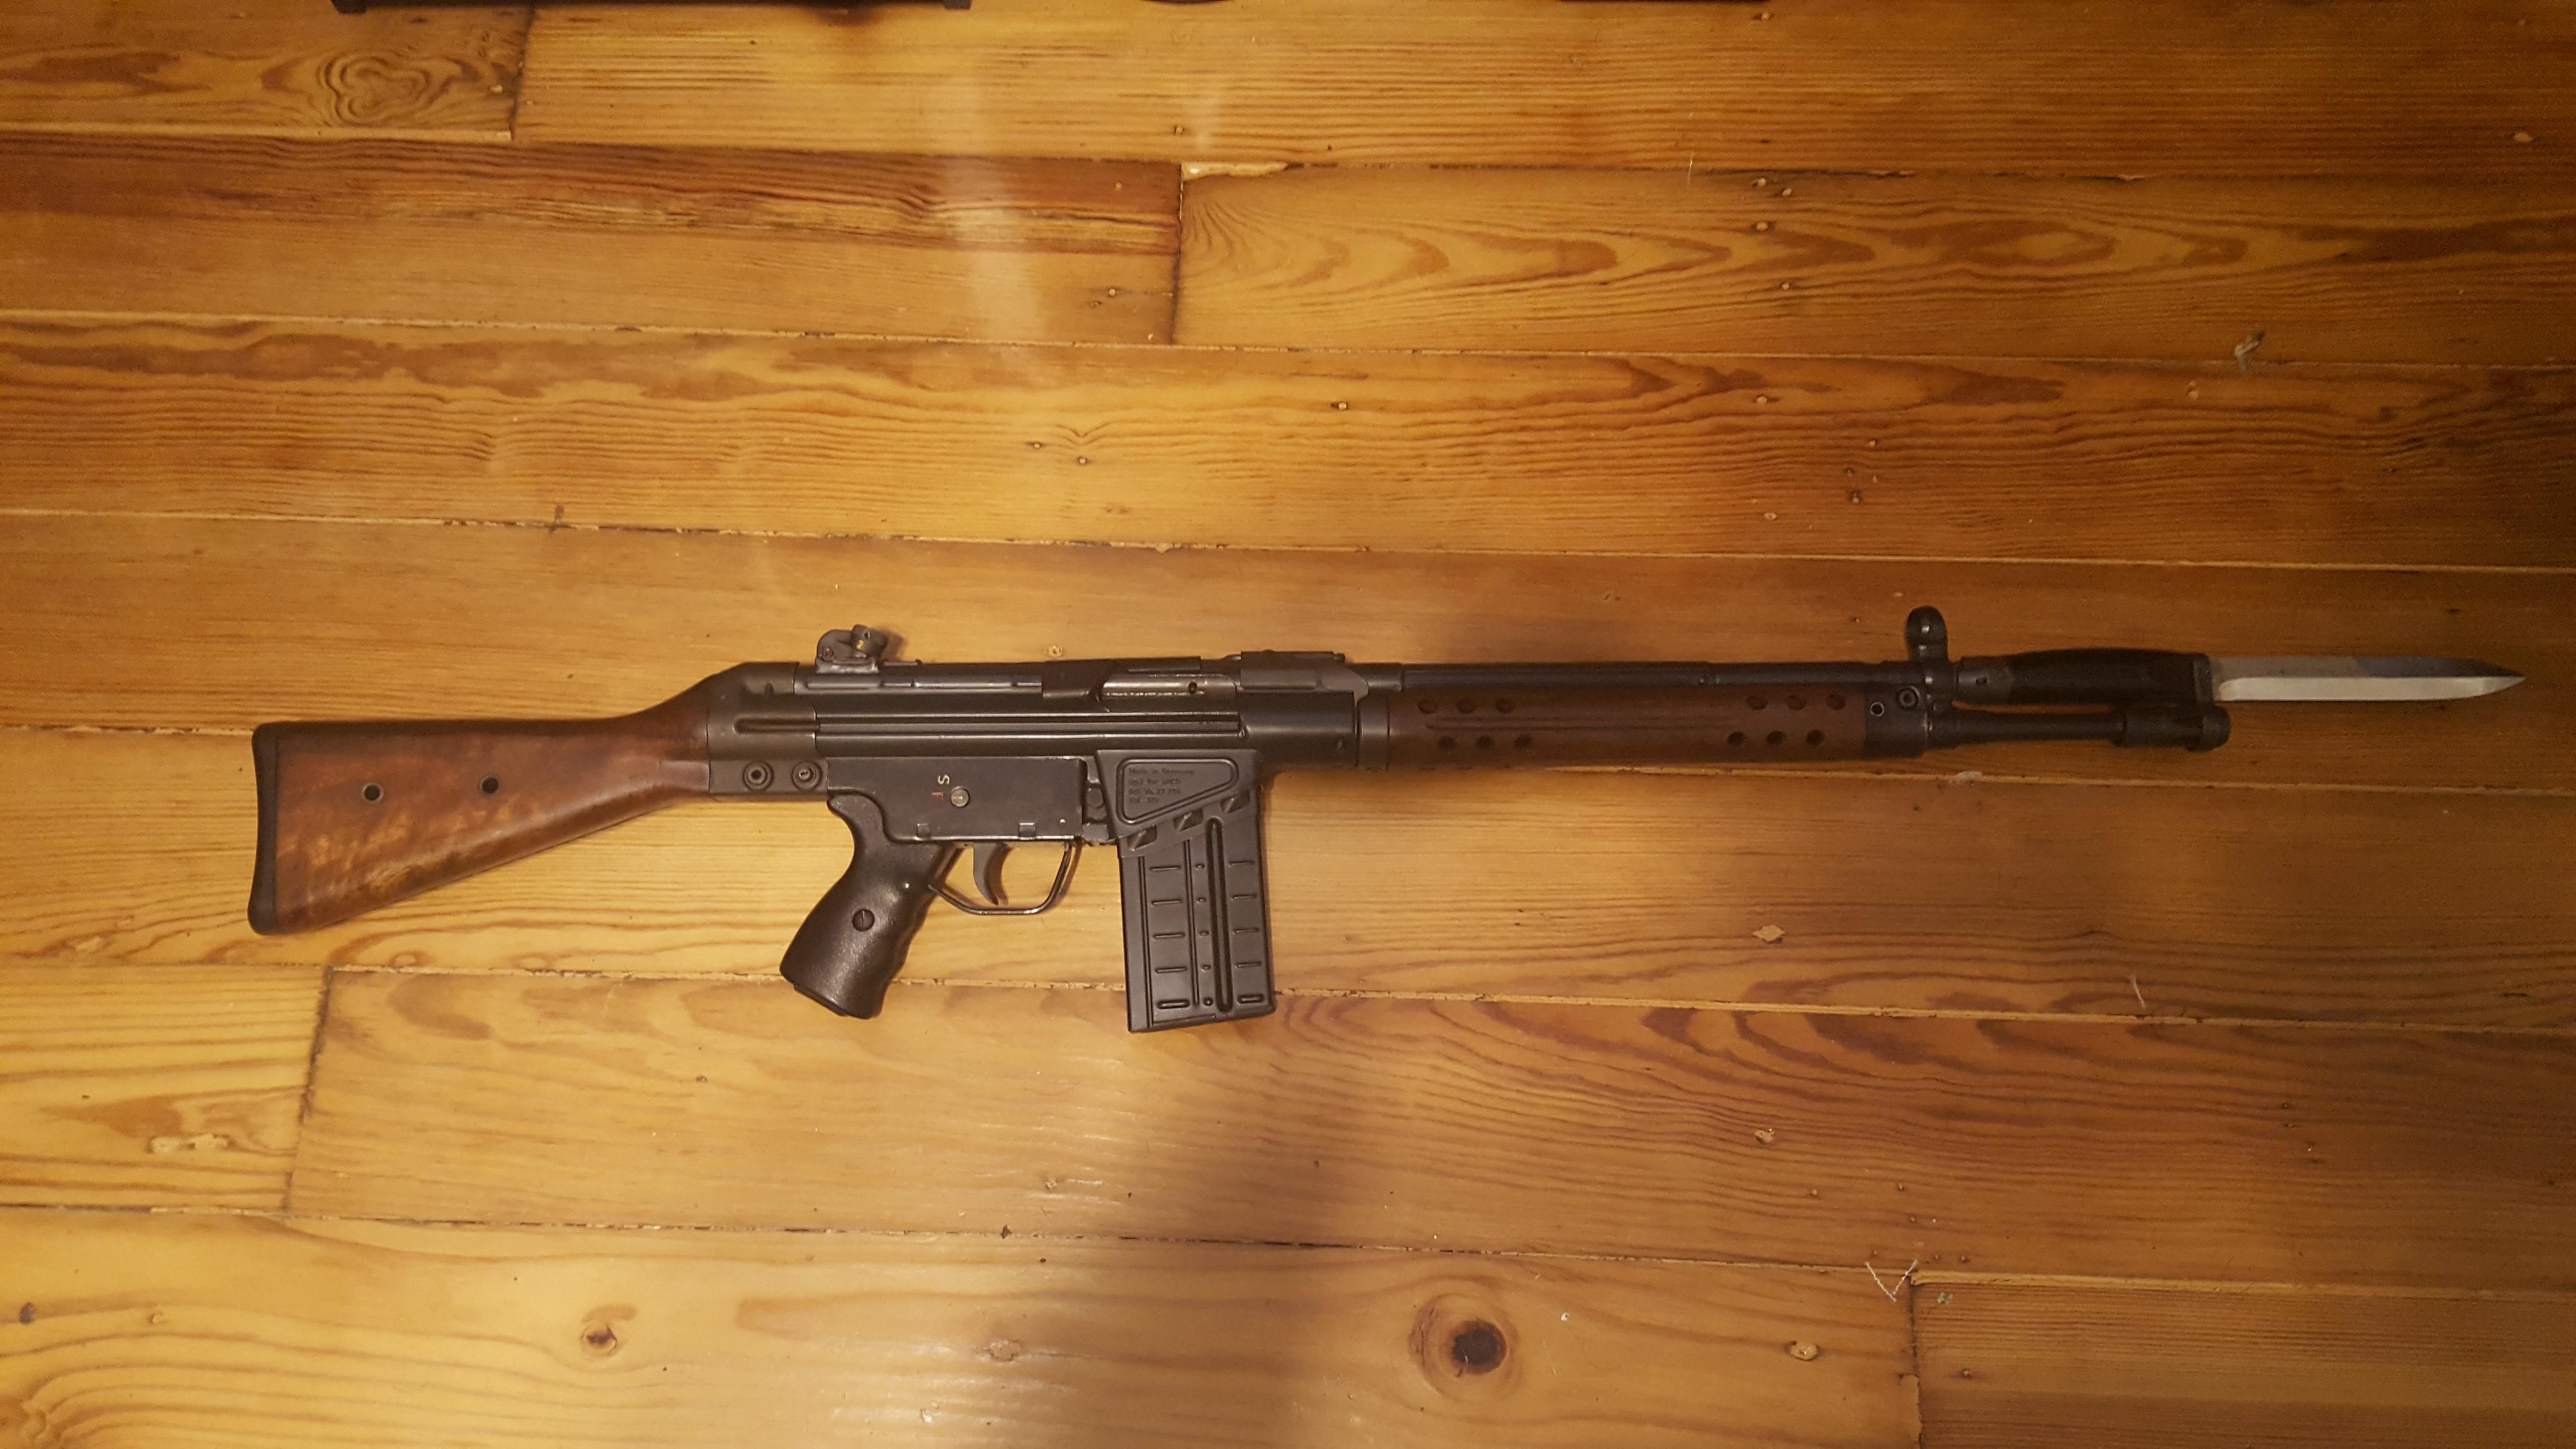 Early HK91 bayonets?-20190909_132523.jpg